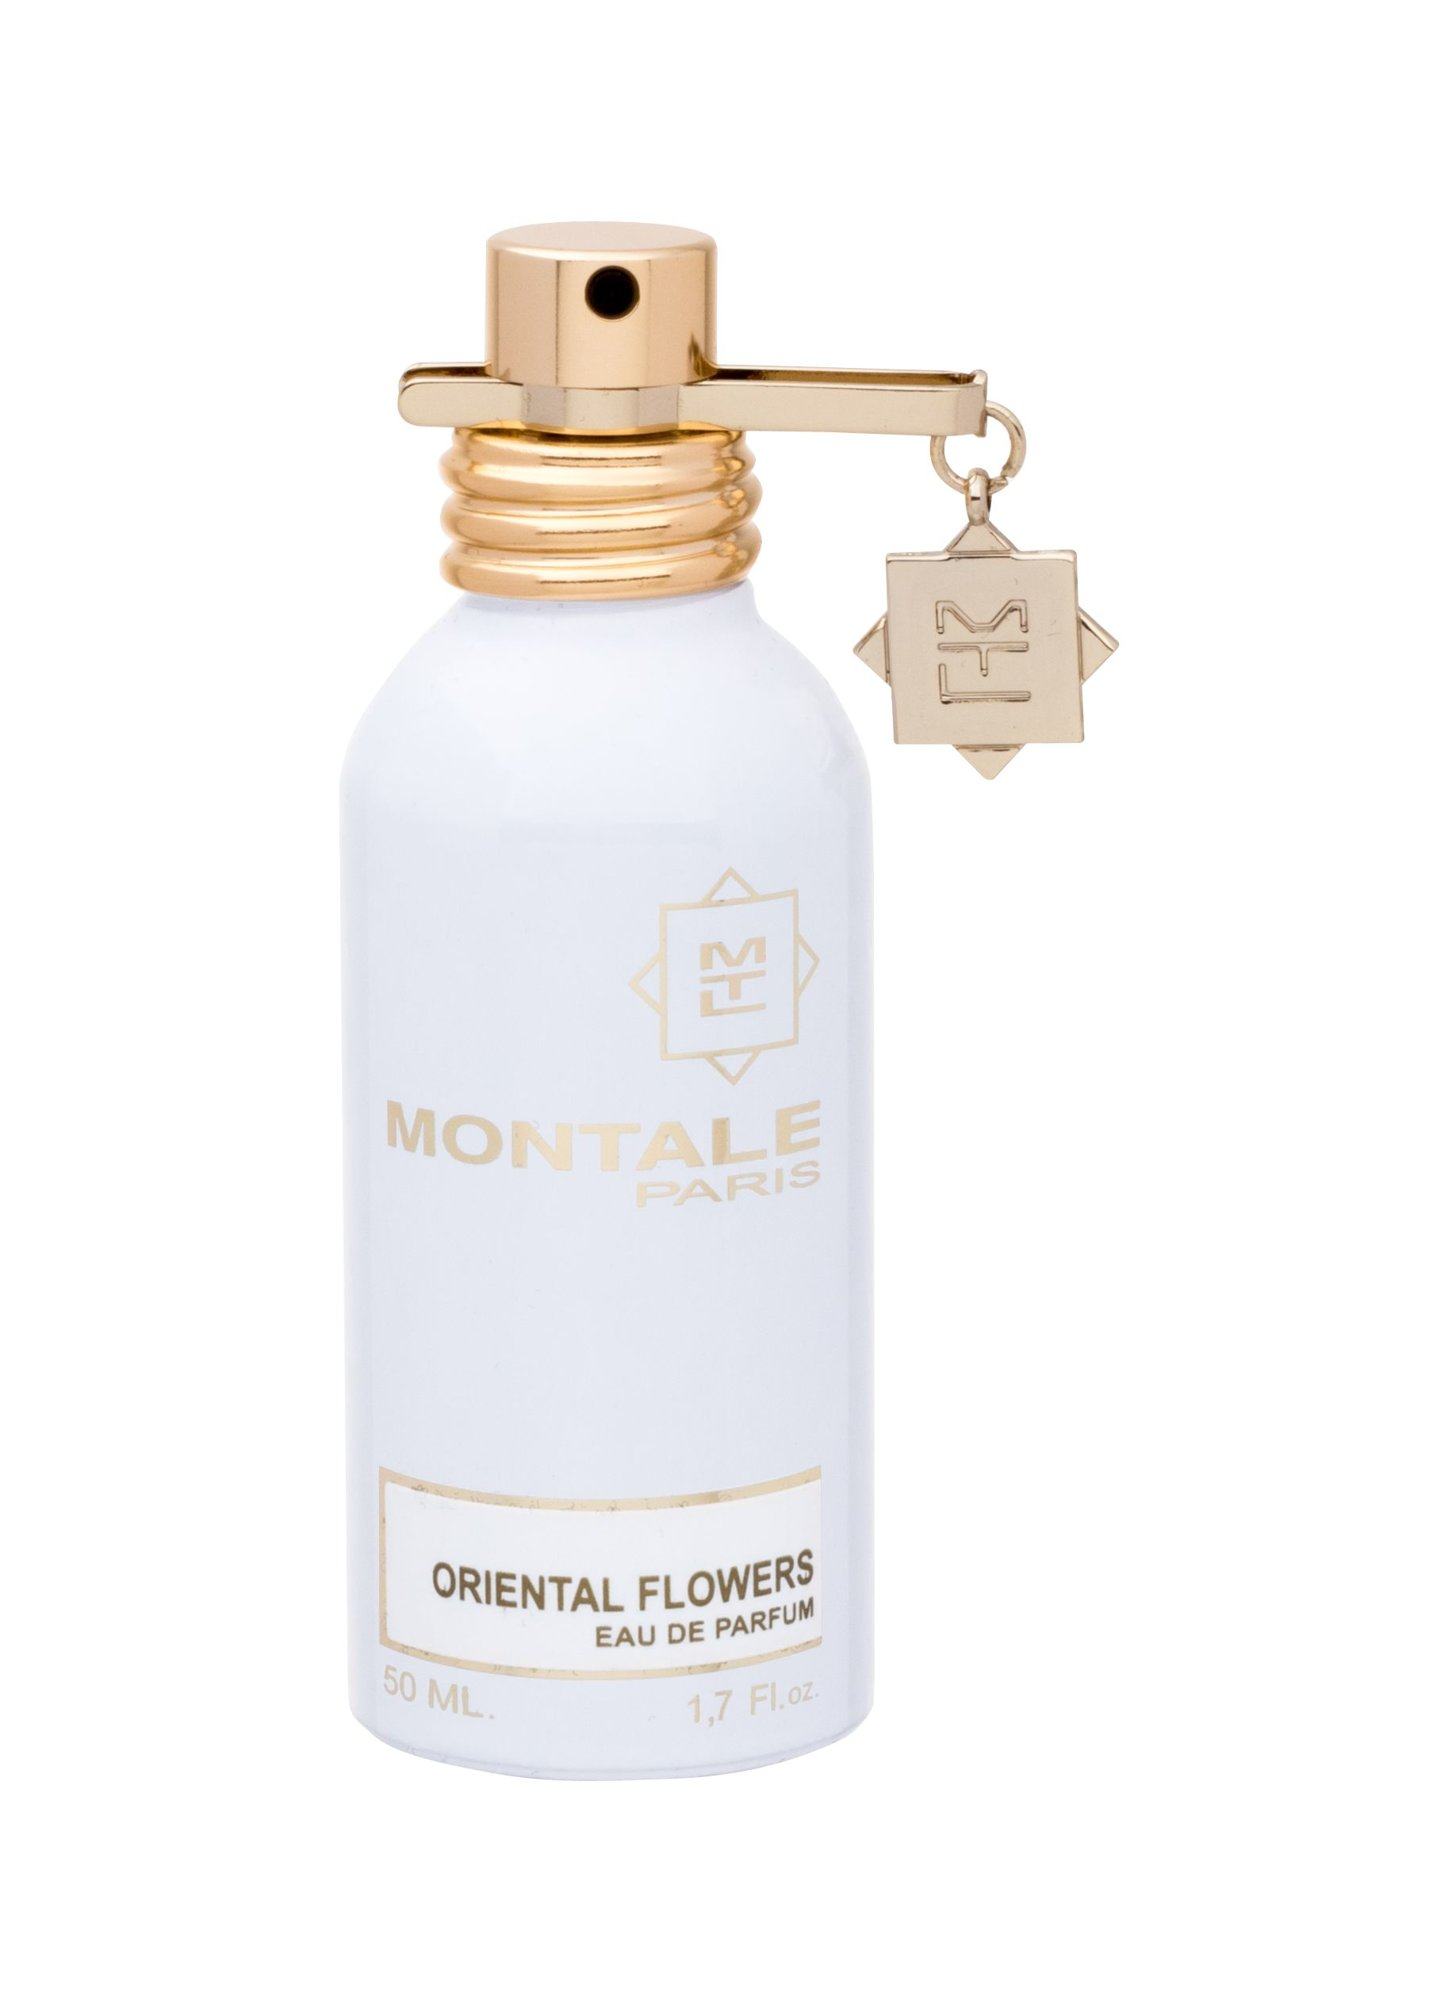 Montale Paris Oriental Flowers EDP 50ml